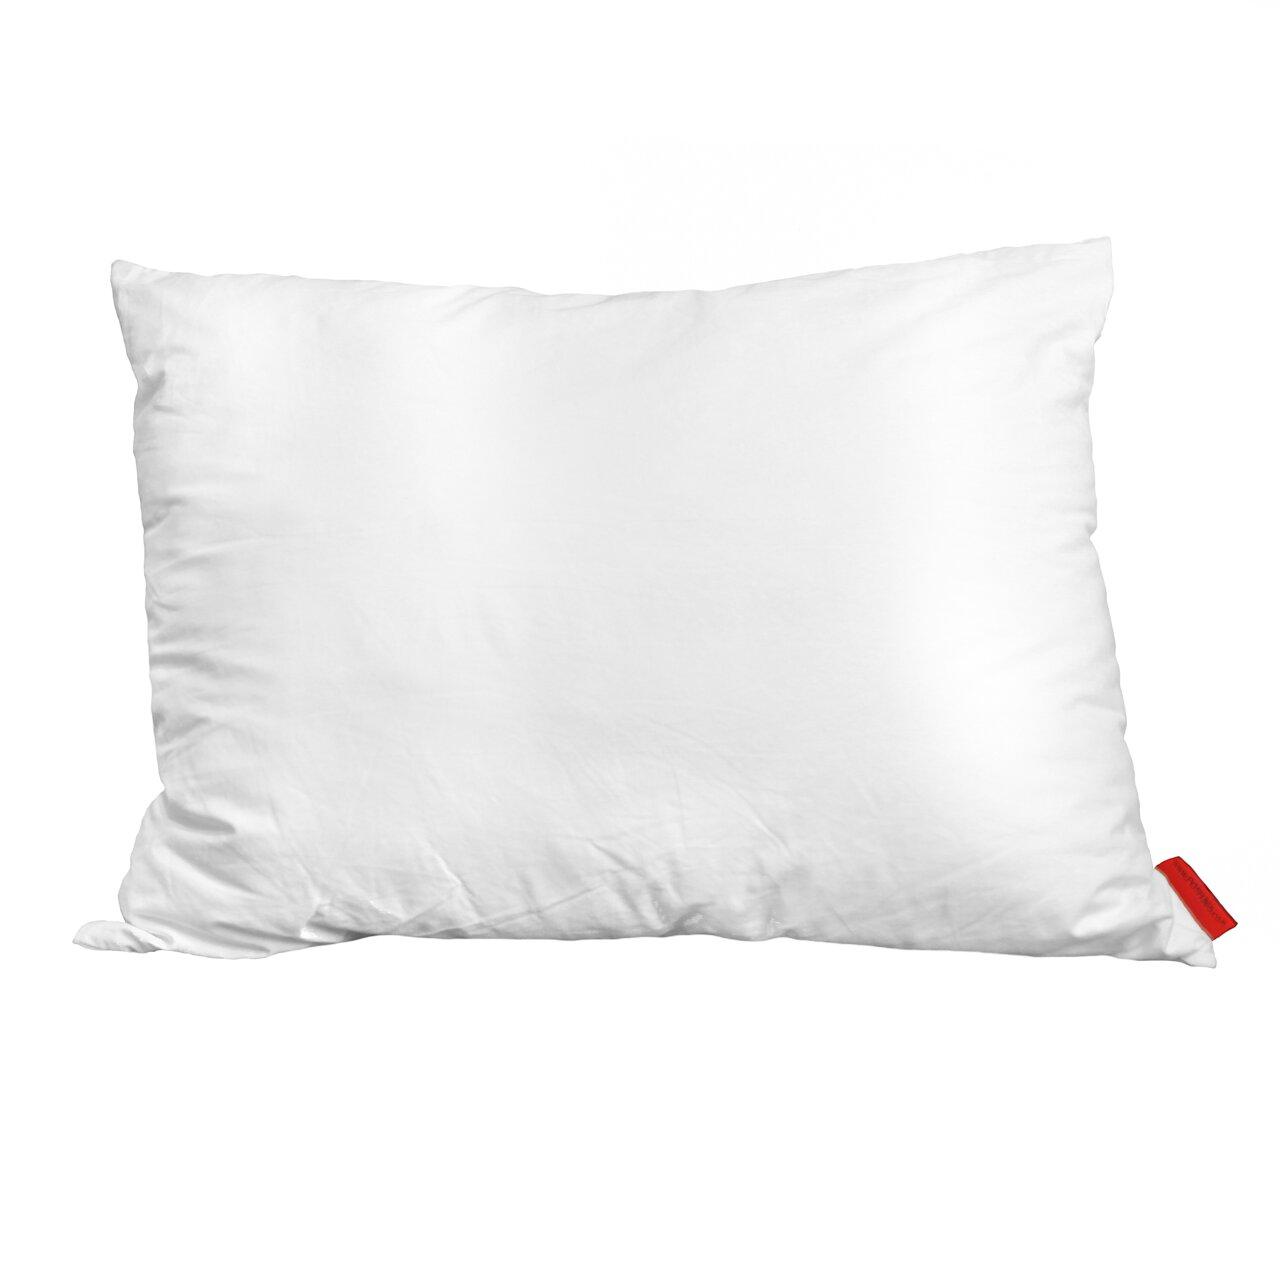 Posh365 Bed Down Alternative Pillow Amp Reviews Wayfair